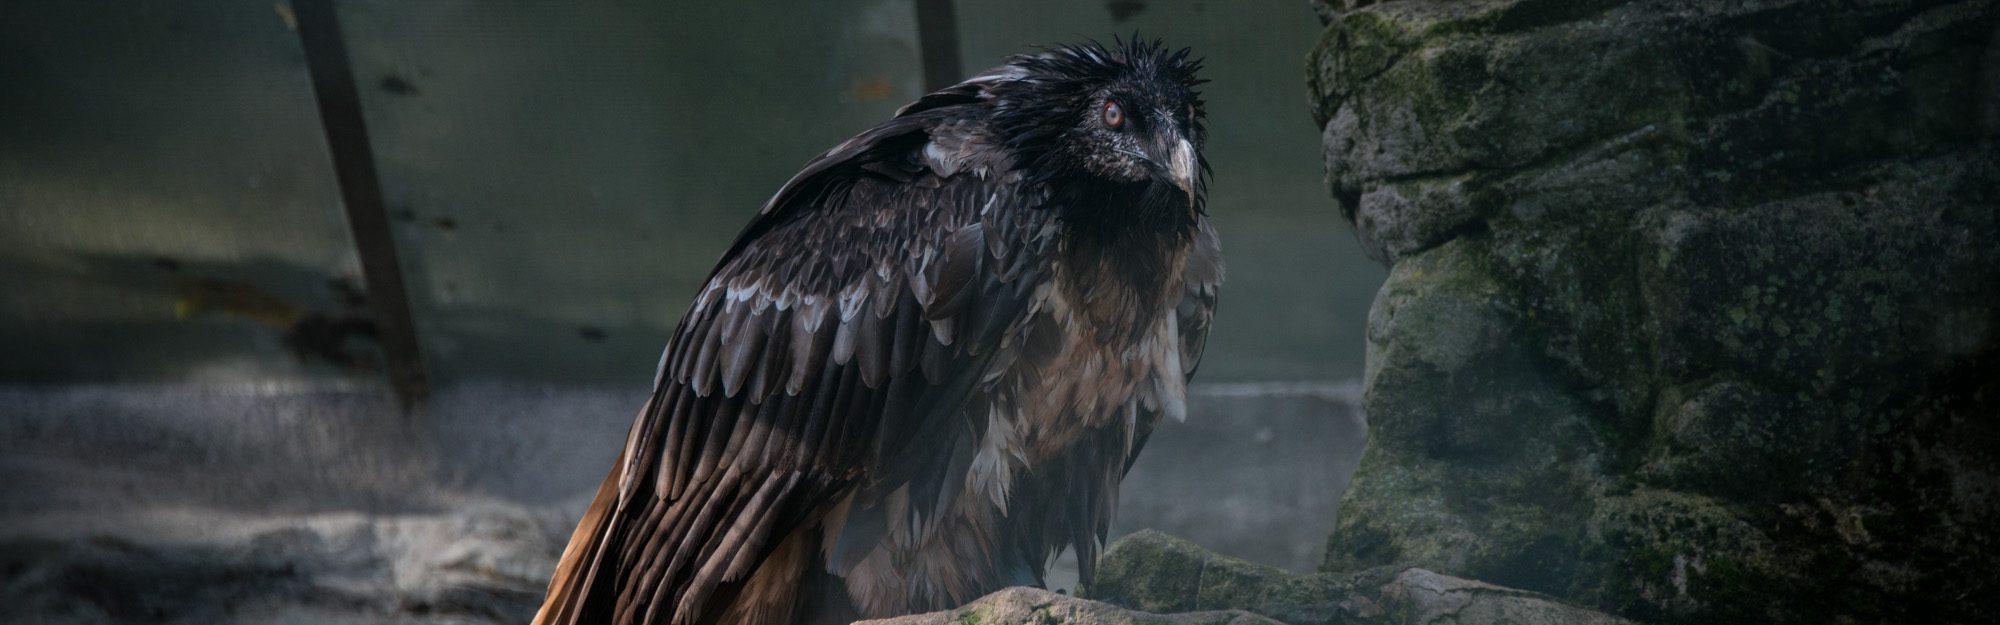 https://faunafocus.com/home/may-2018-bearded-vulture/#jp-carousel-7884